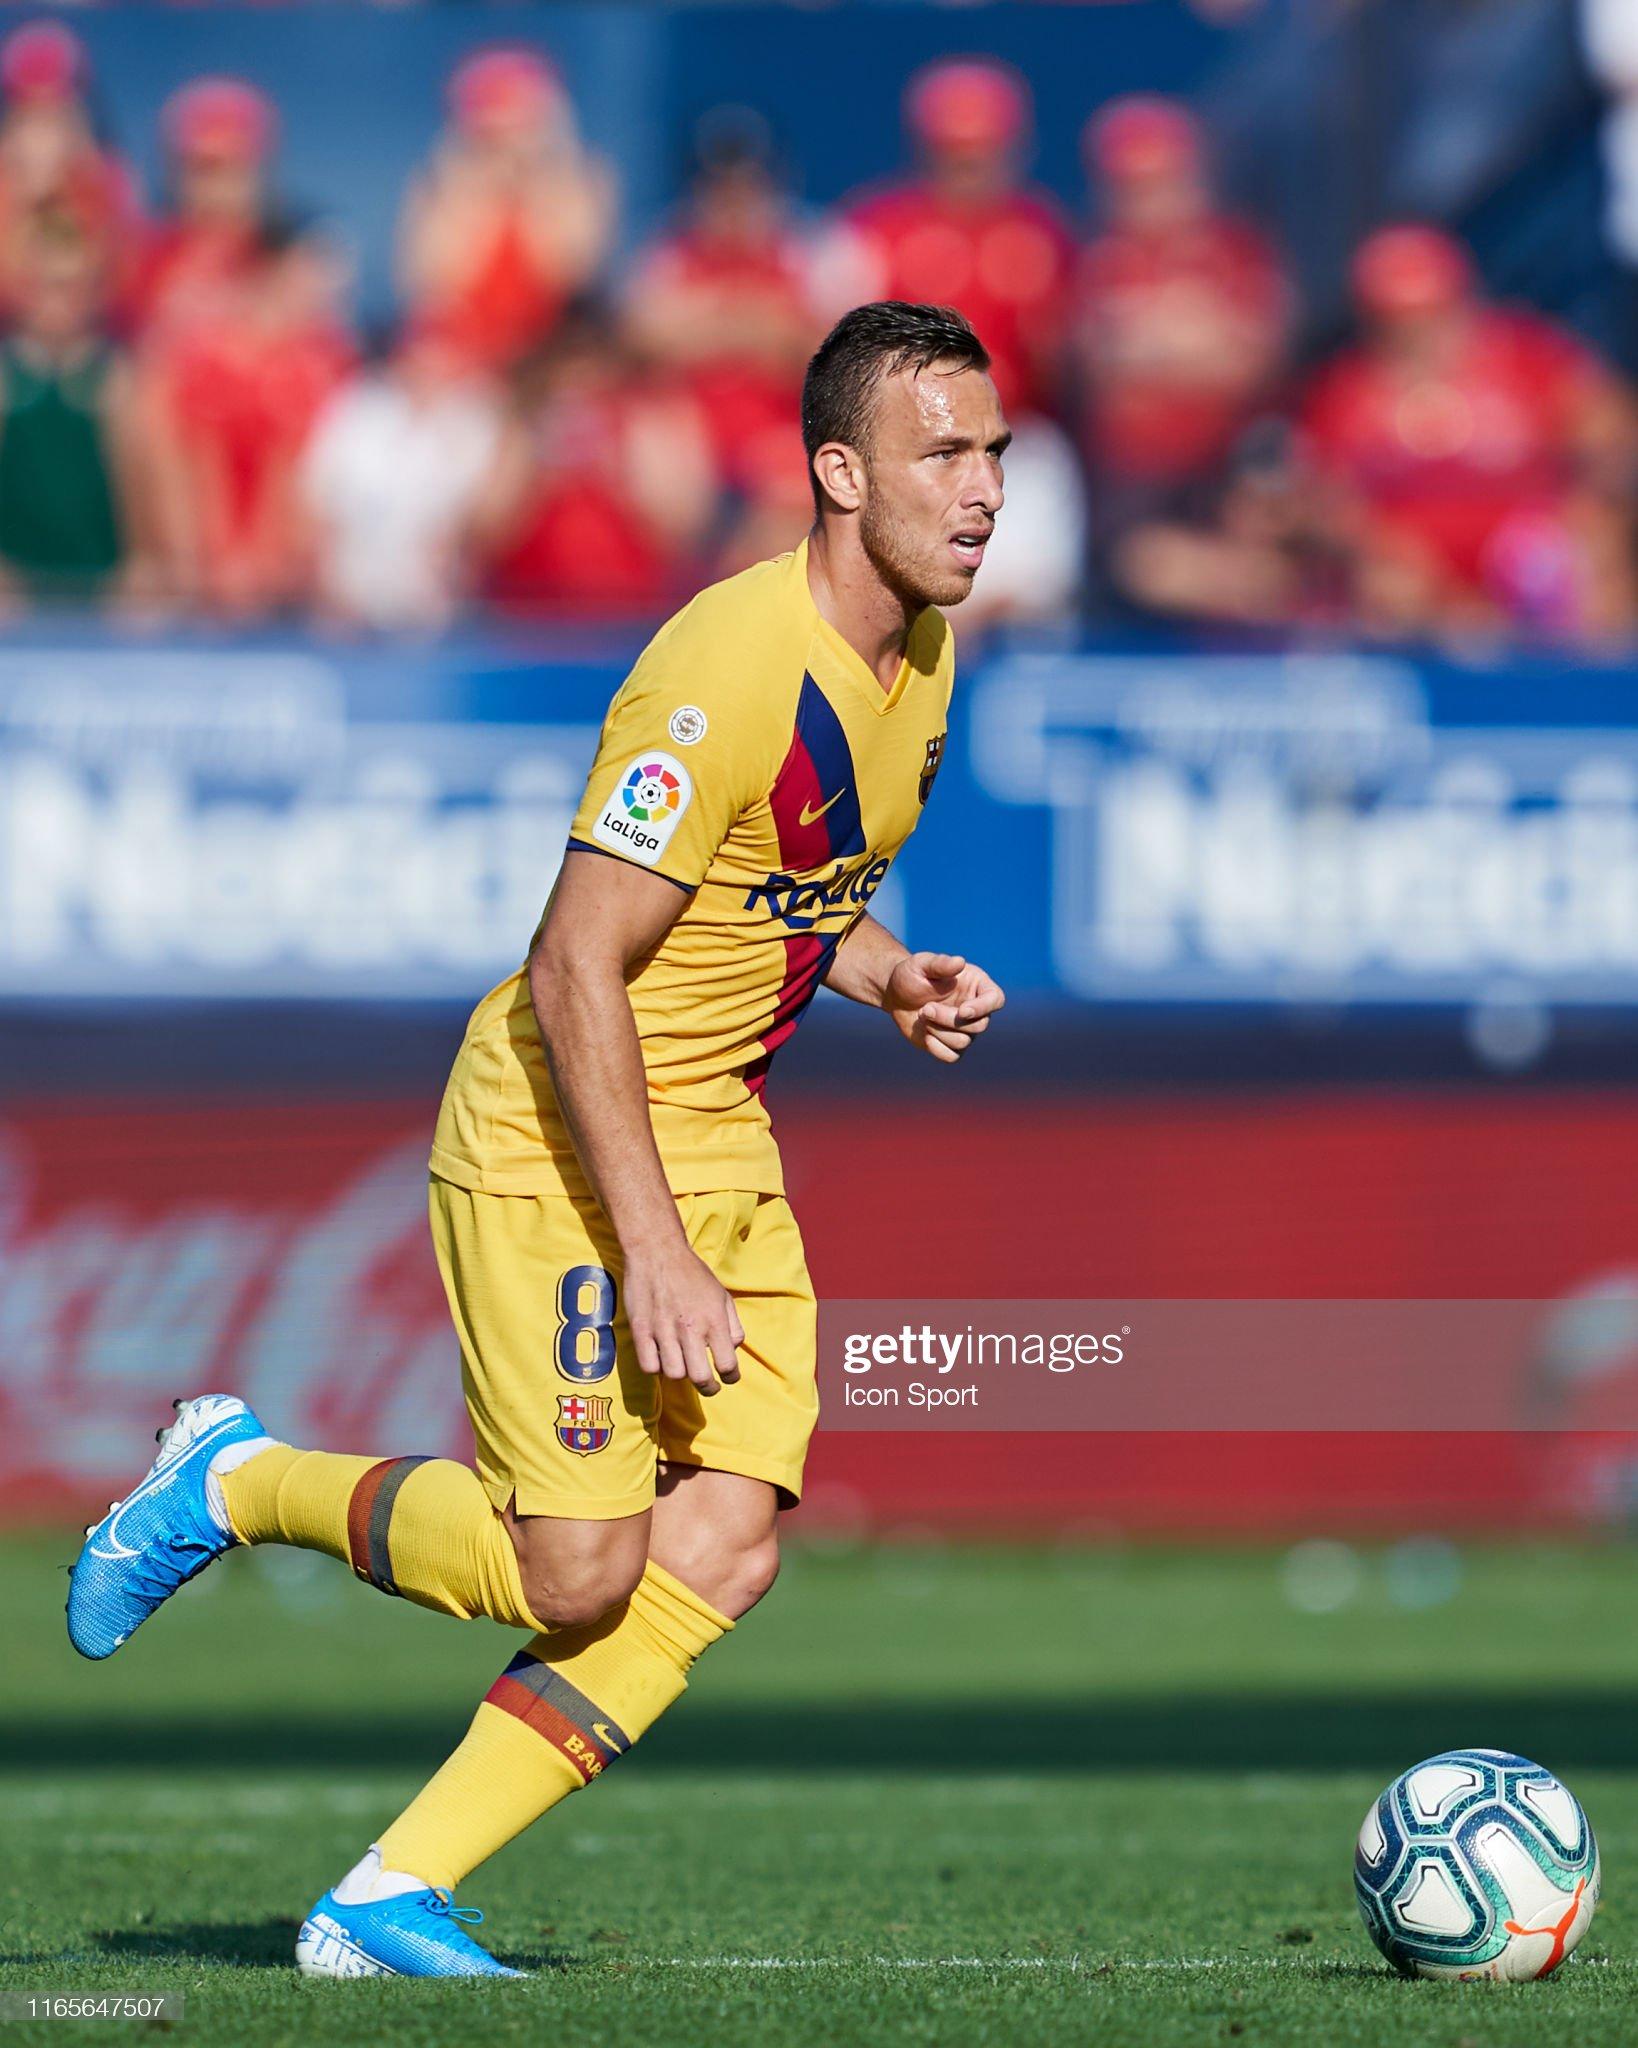 صور مباراة : أوساسونا - برشلونة 2-2 ( 31-08-2019 )  Arthur-henrique-melo-of-fc-barcelona-during-the-liga-match-between-picture-id1165647507?s=2048x2048